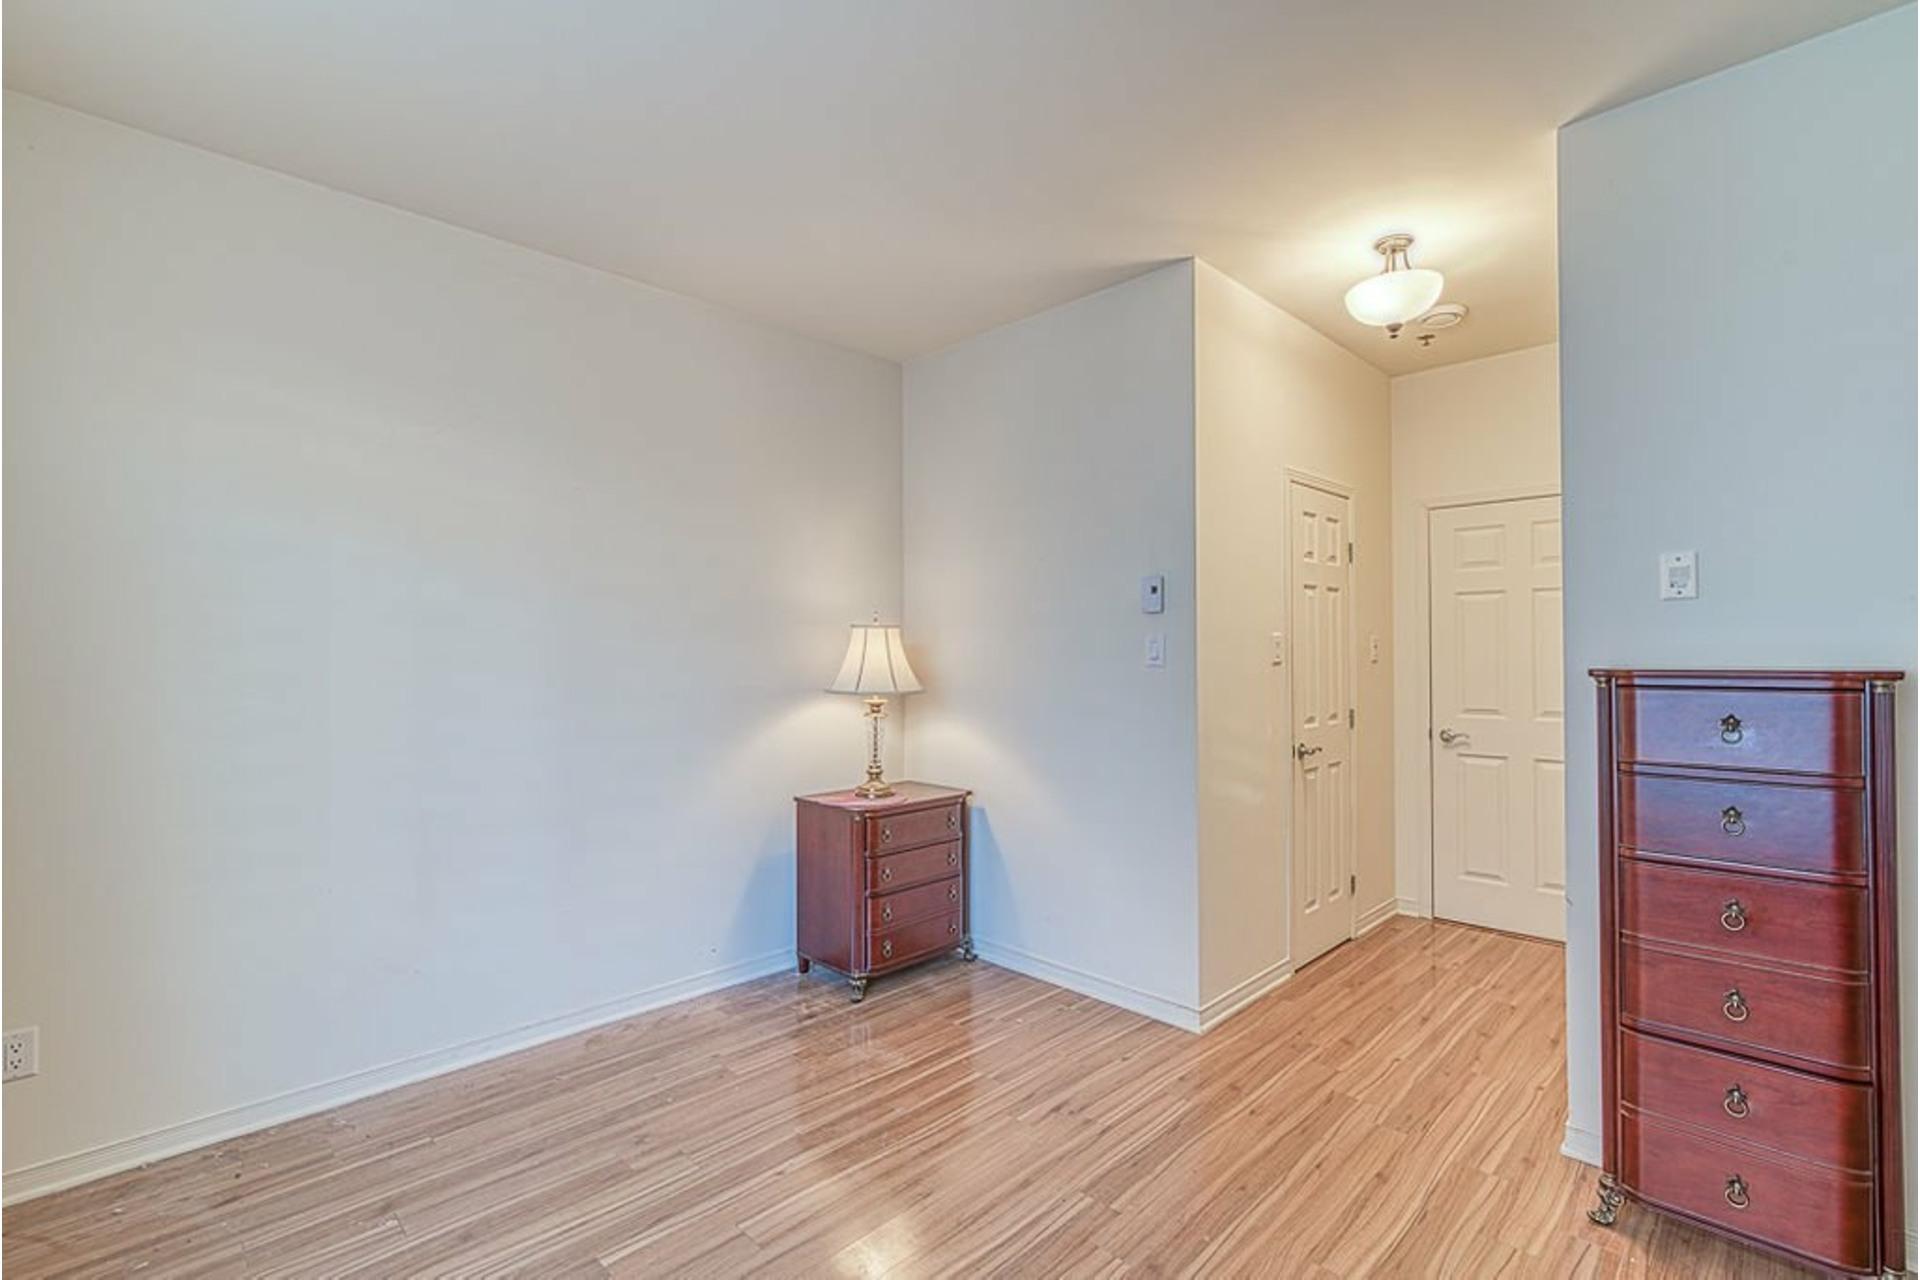 image 18 - Apartment For sale Le Vieux-Longueuil Longueuil  - 7 rooms